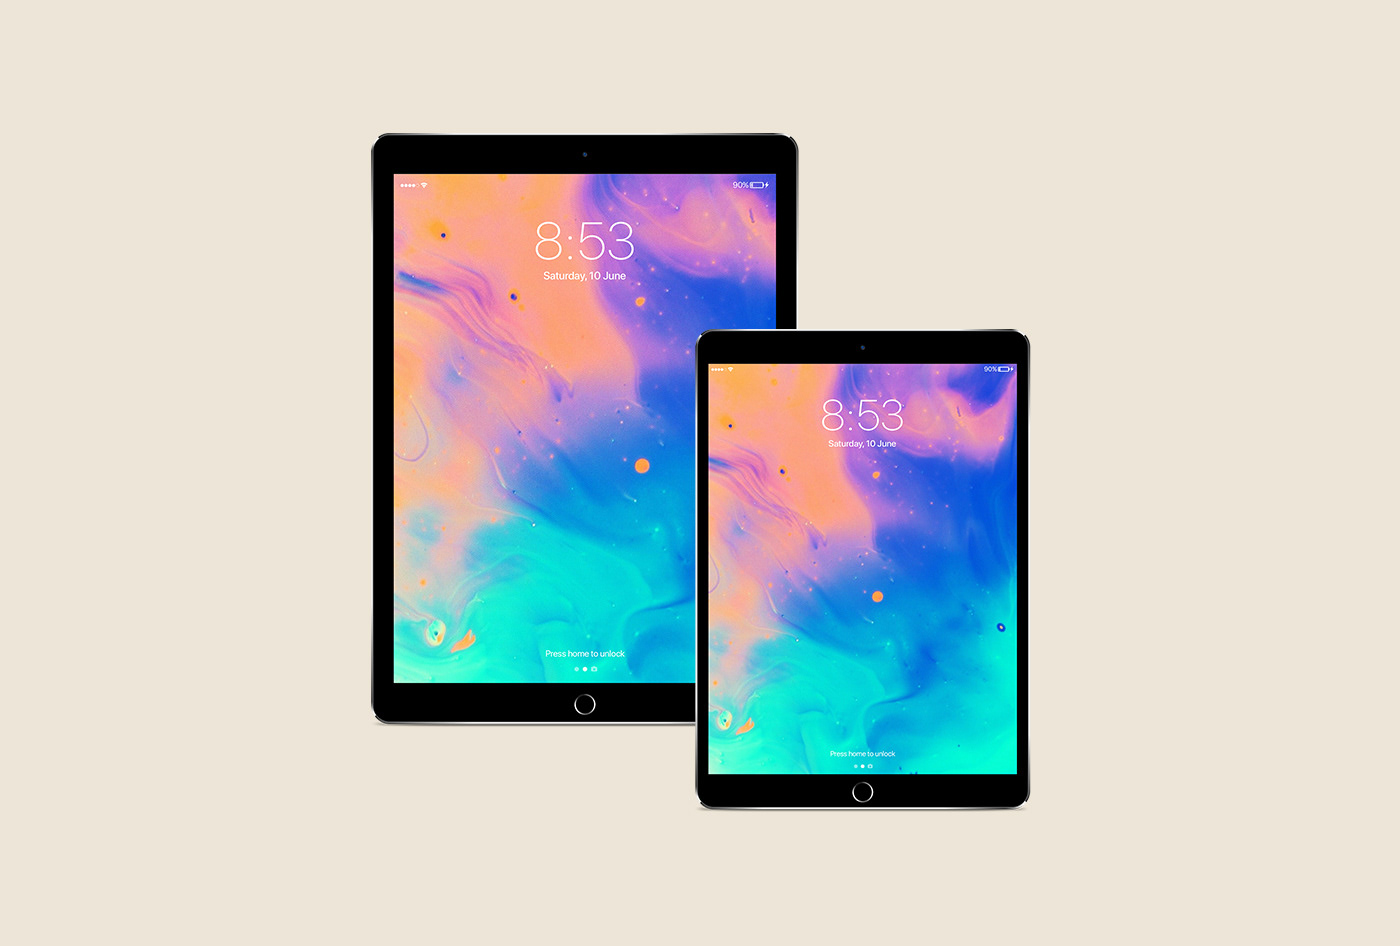 iPad pro Mockup apple device ipad pro iPhone x ios